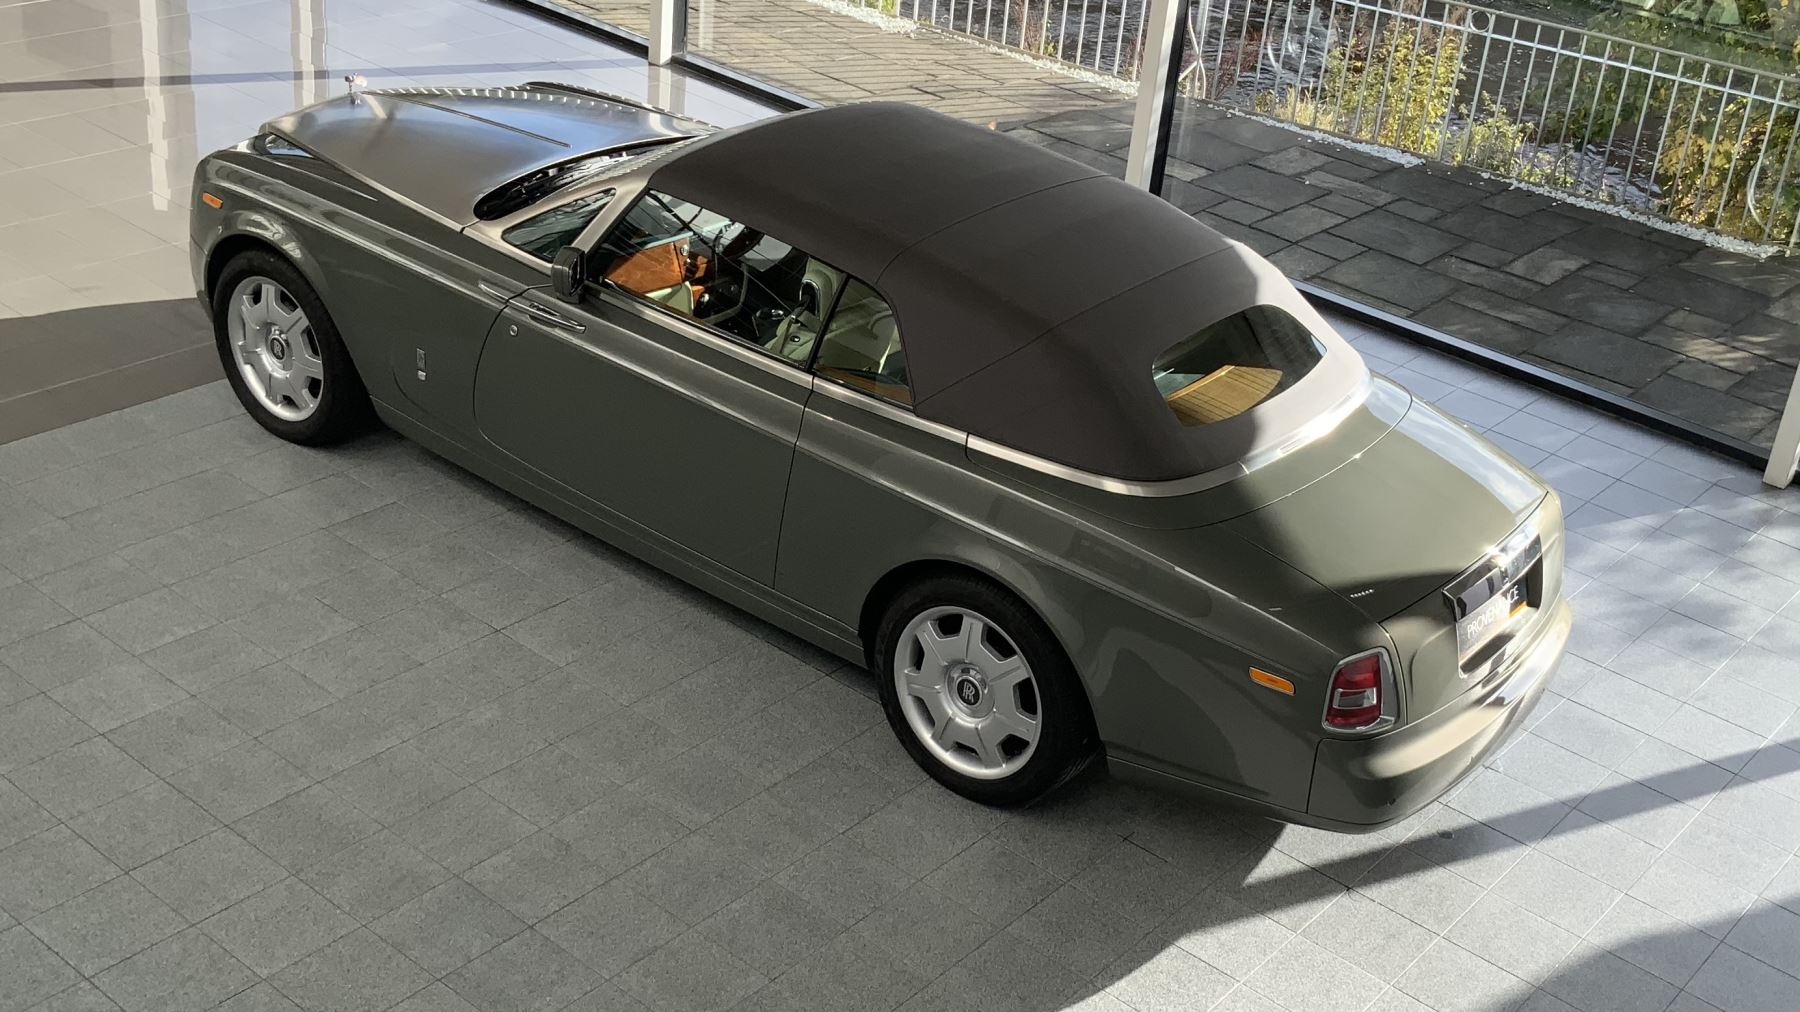 Rolls-Royce Phantom Drophead Coupe 2dr Auto image 18